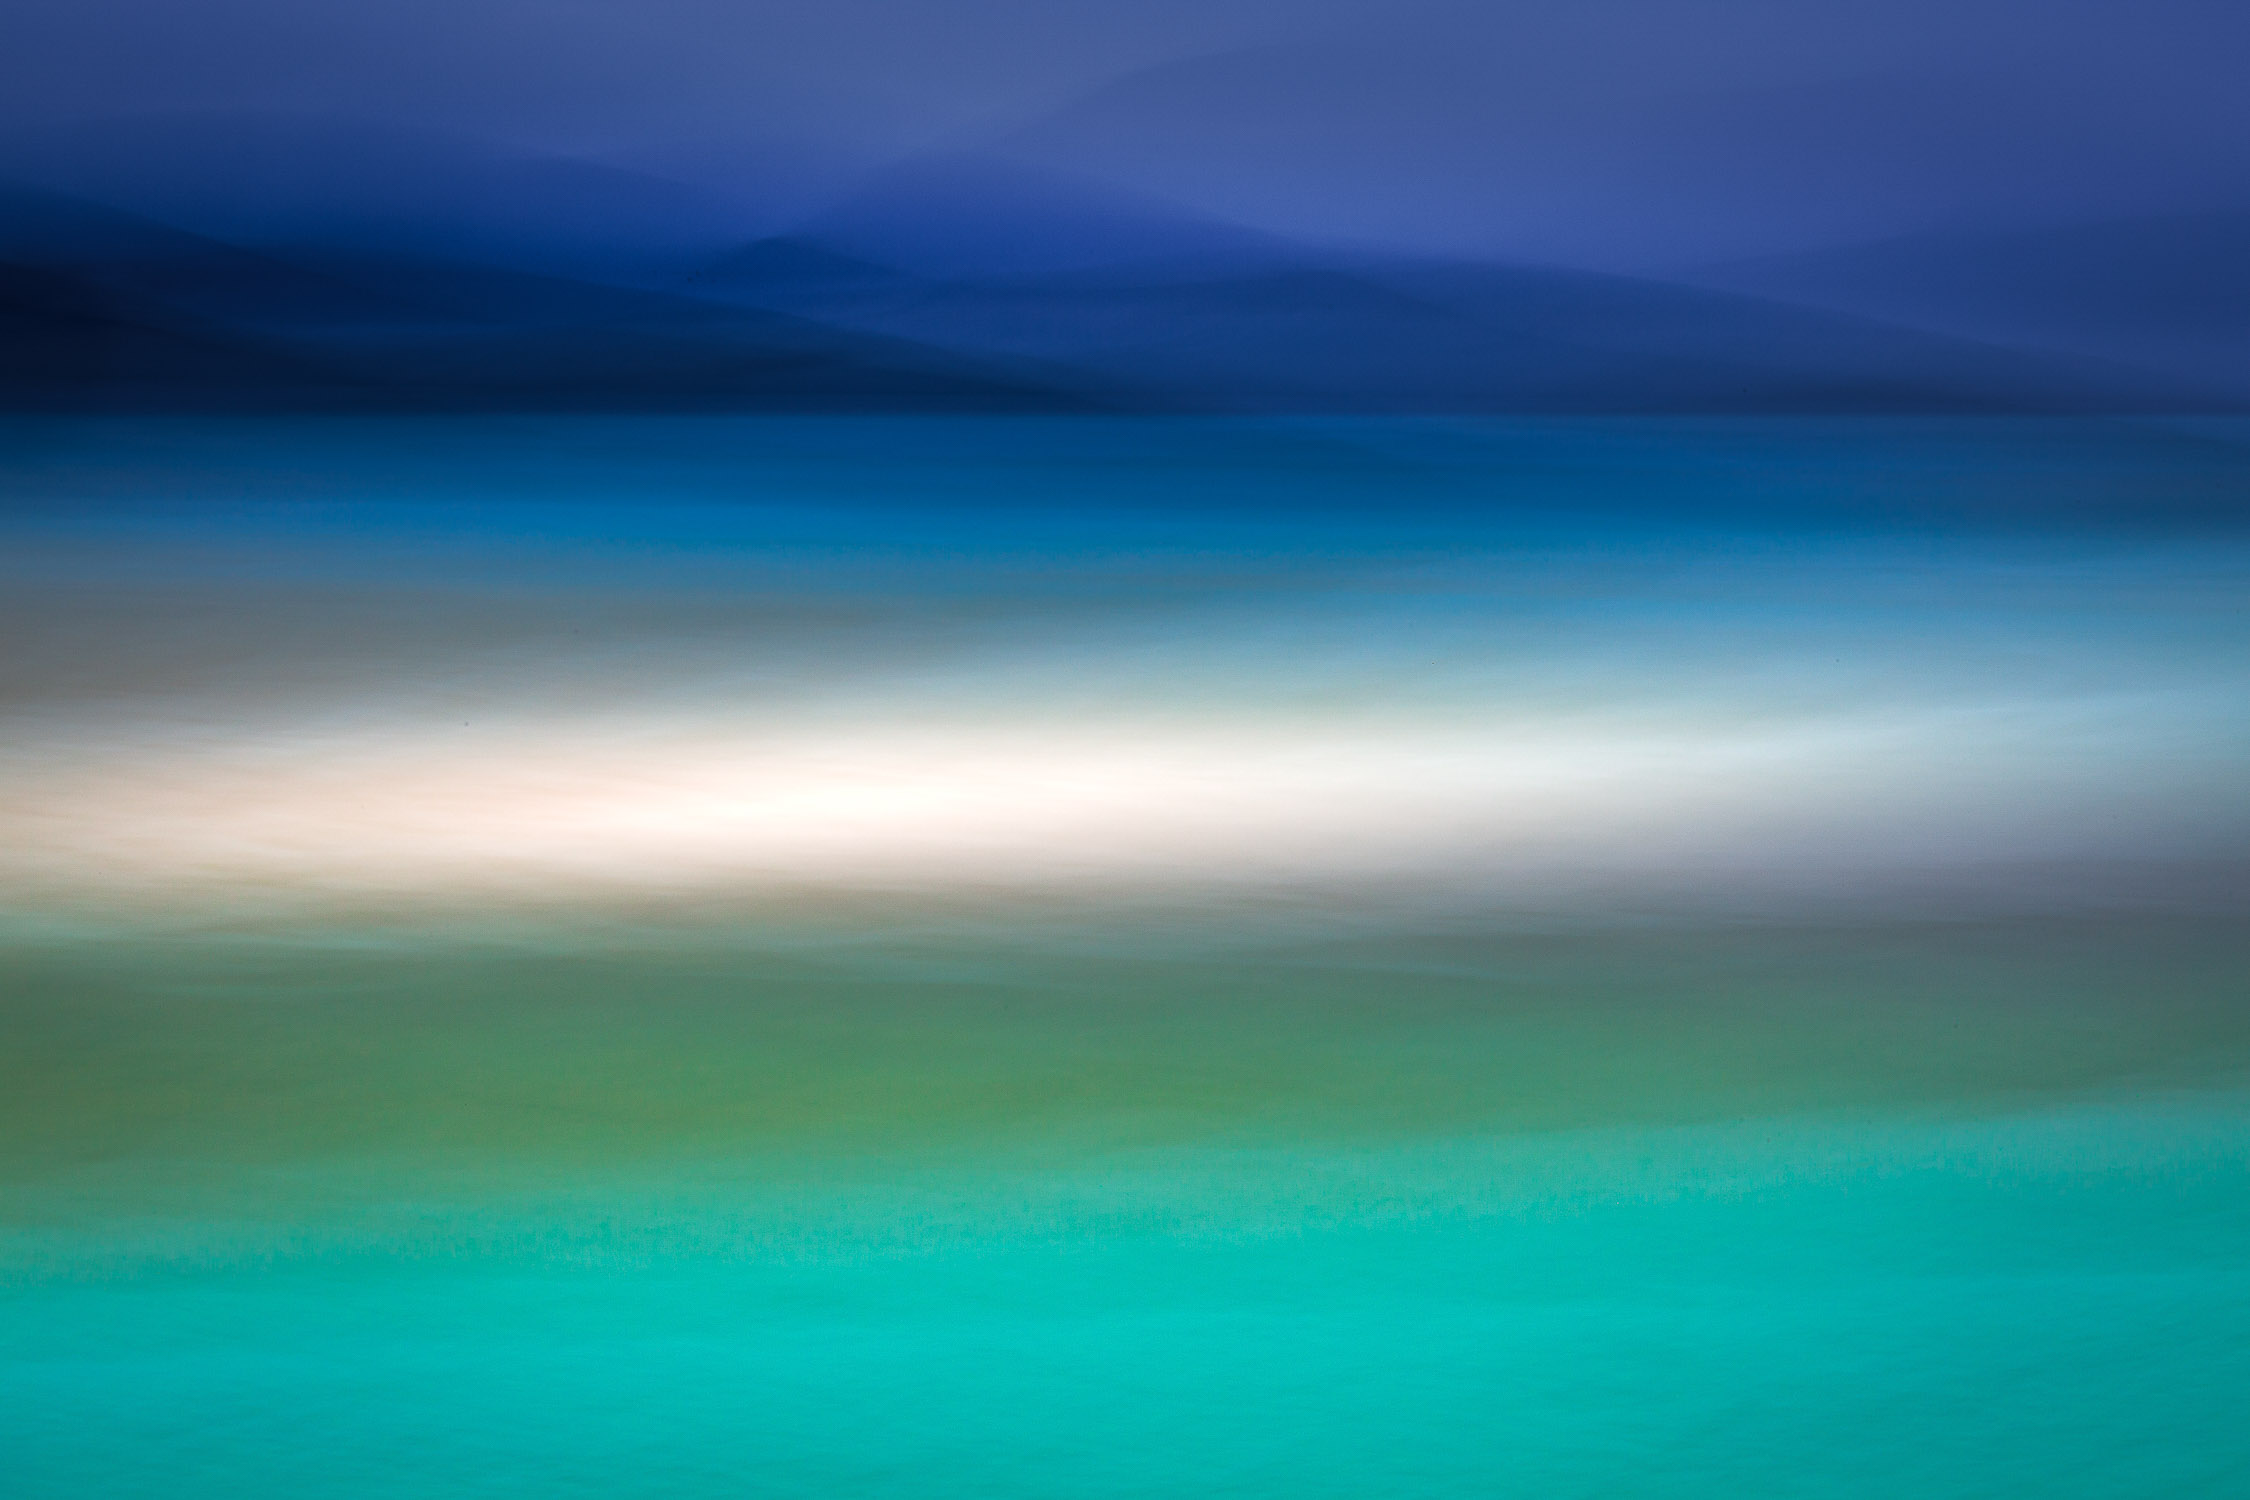 A sigh of the sea....